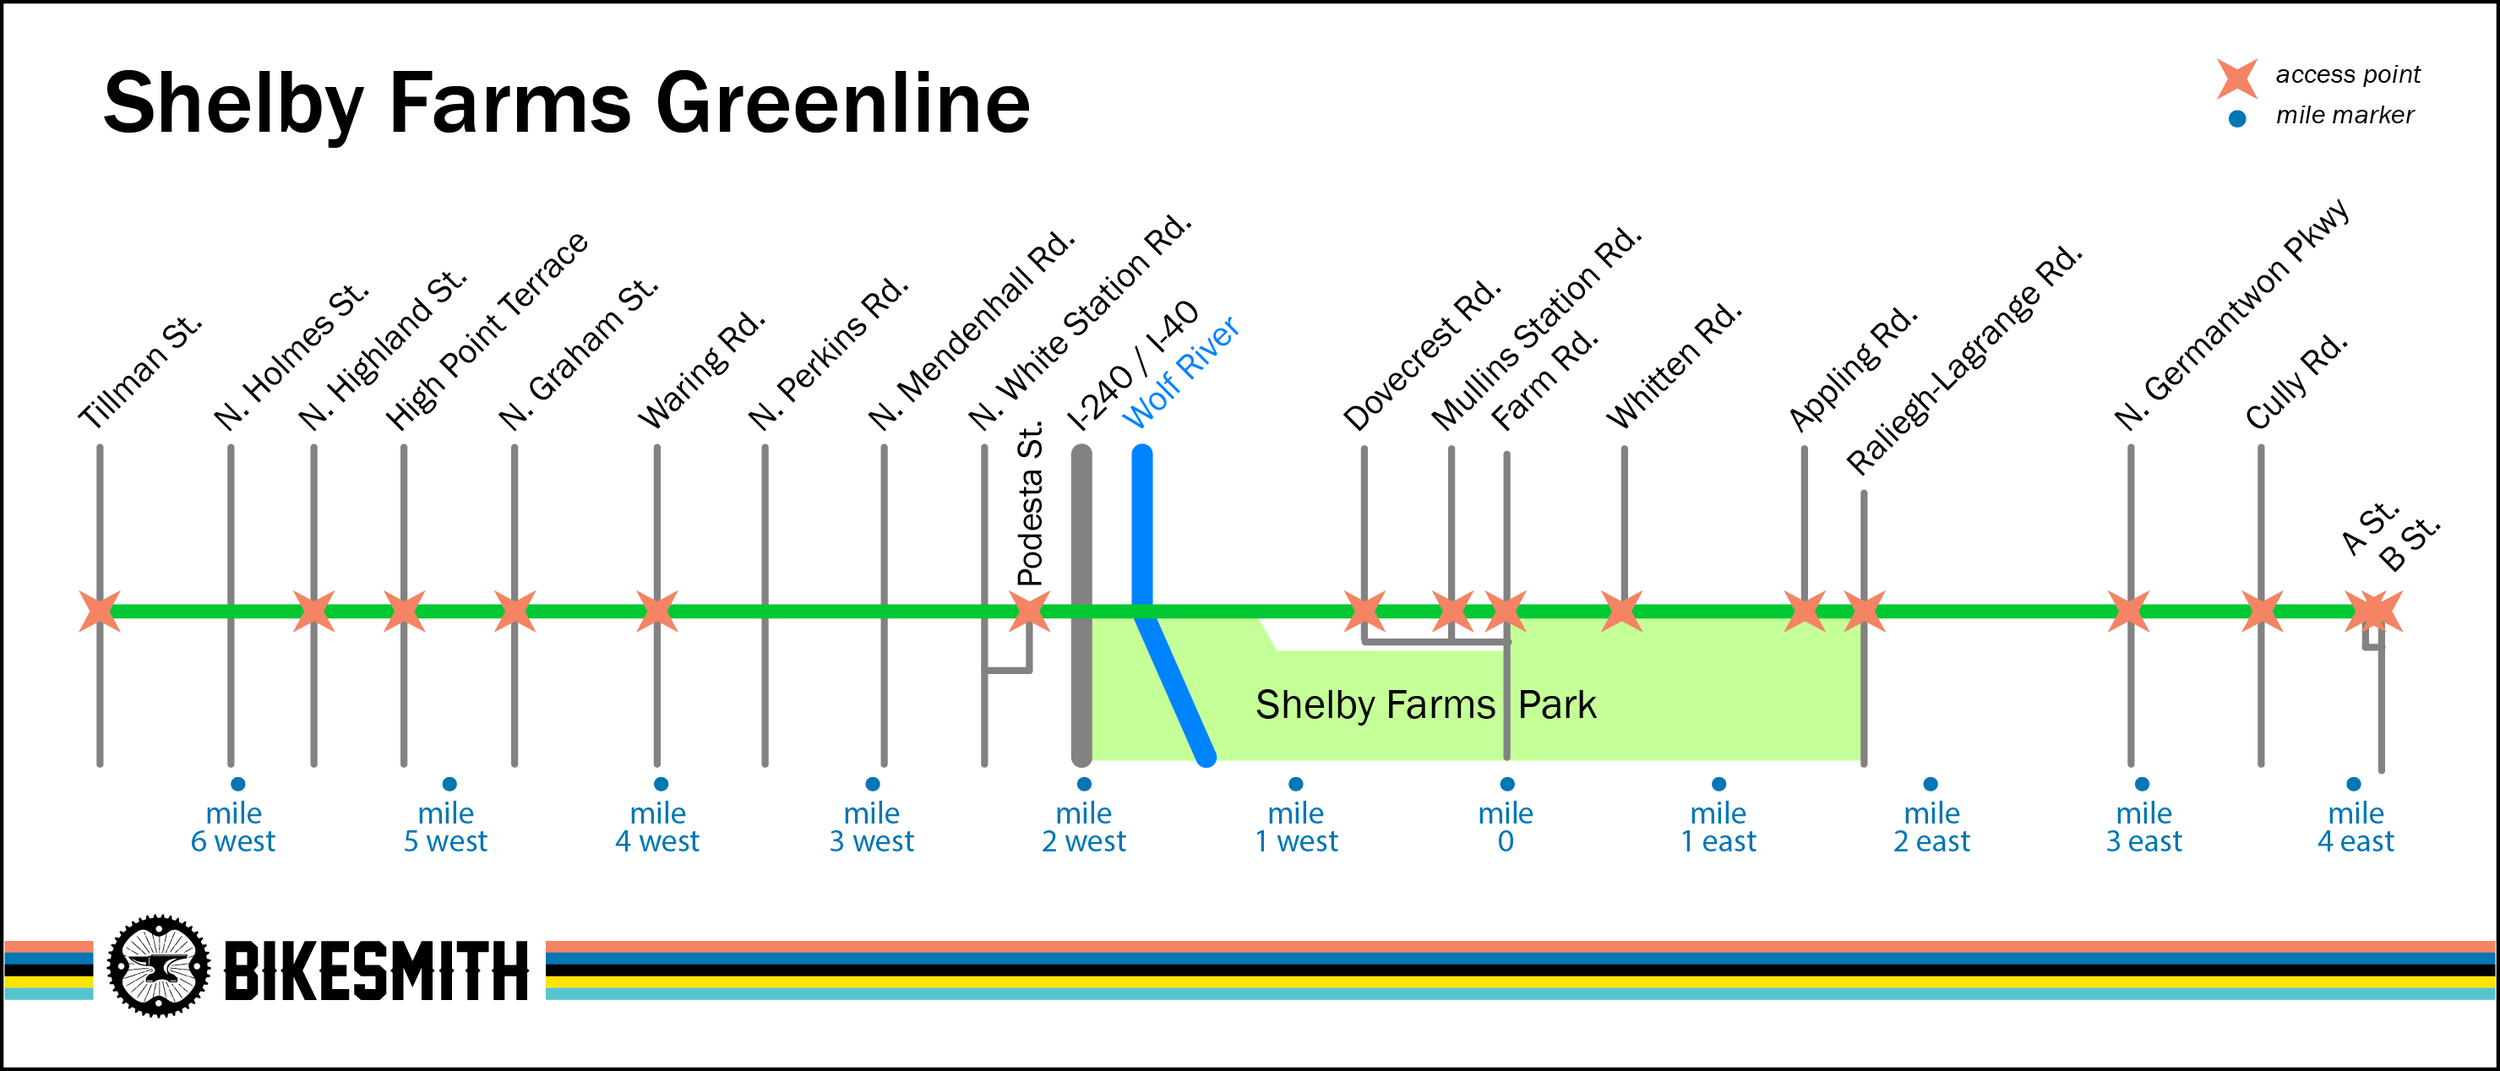 memphis greenline map